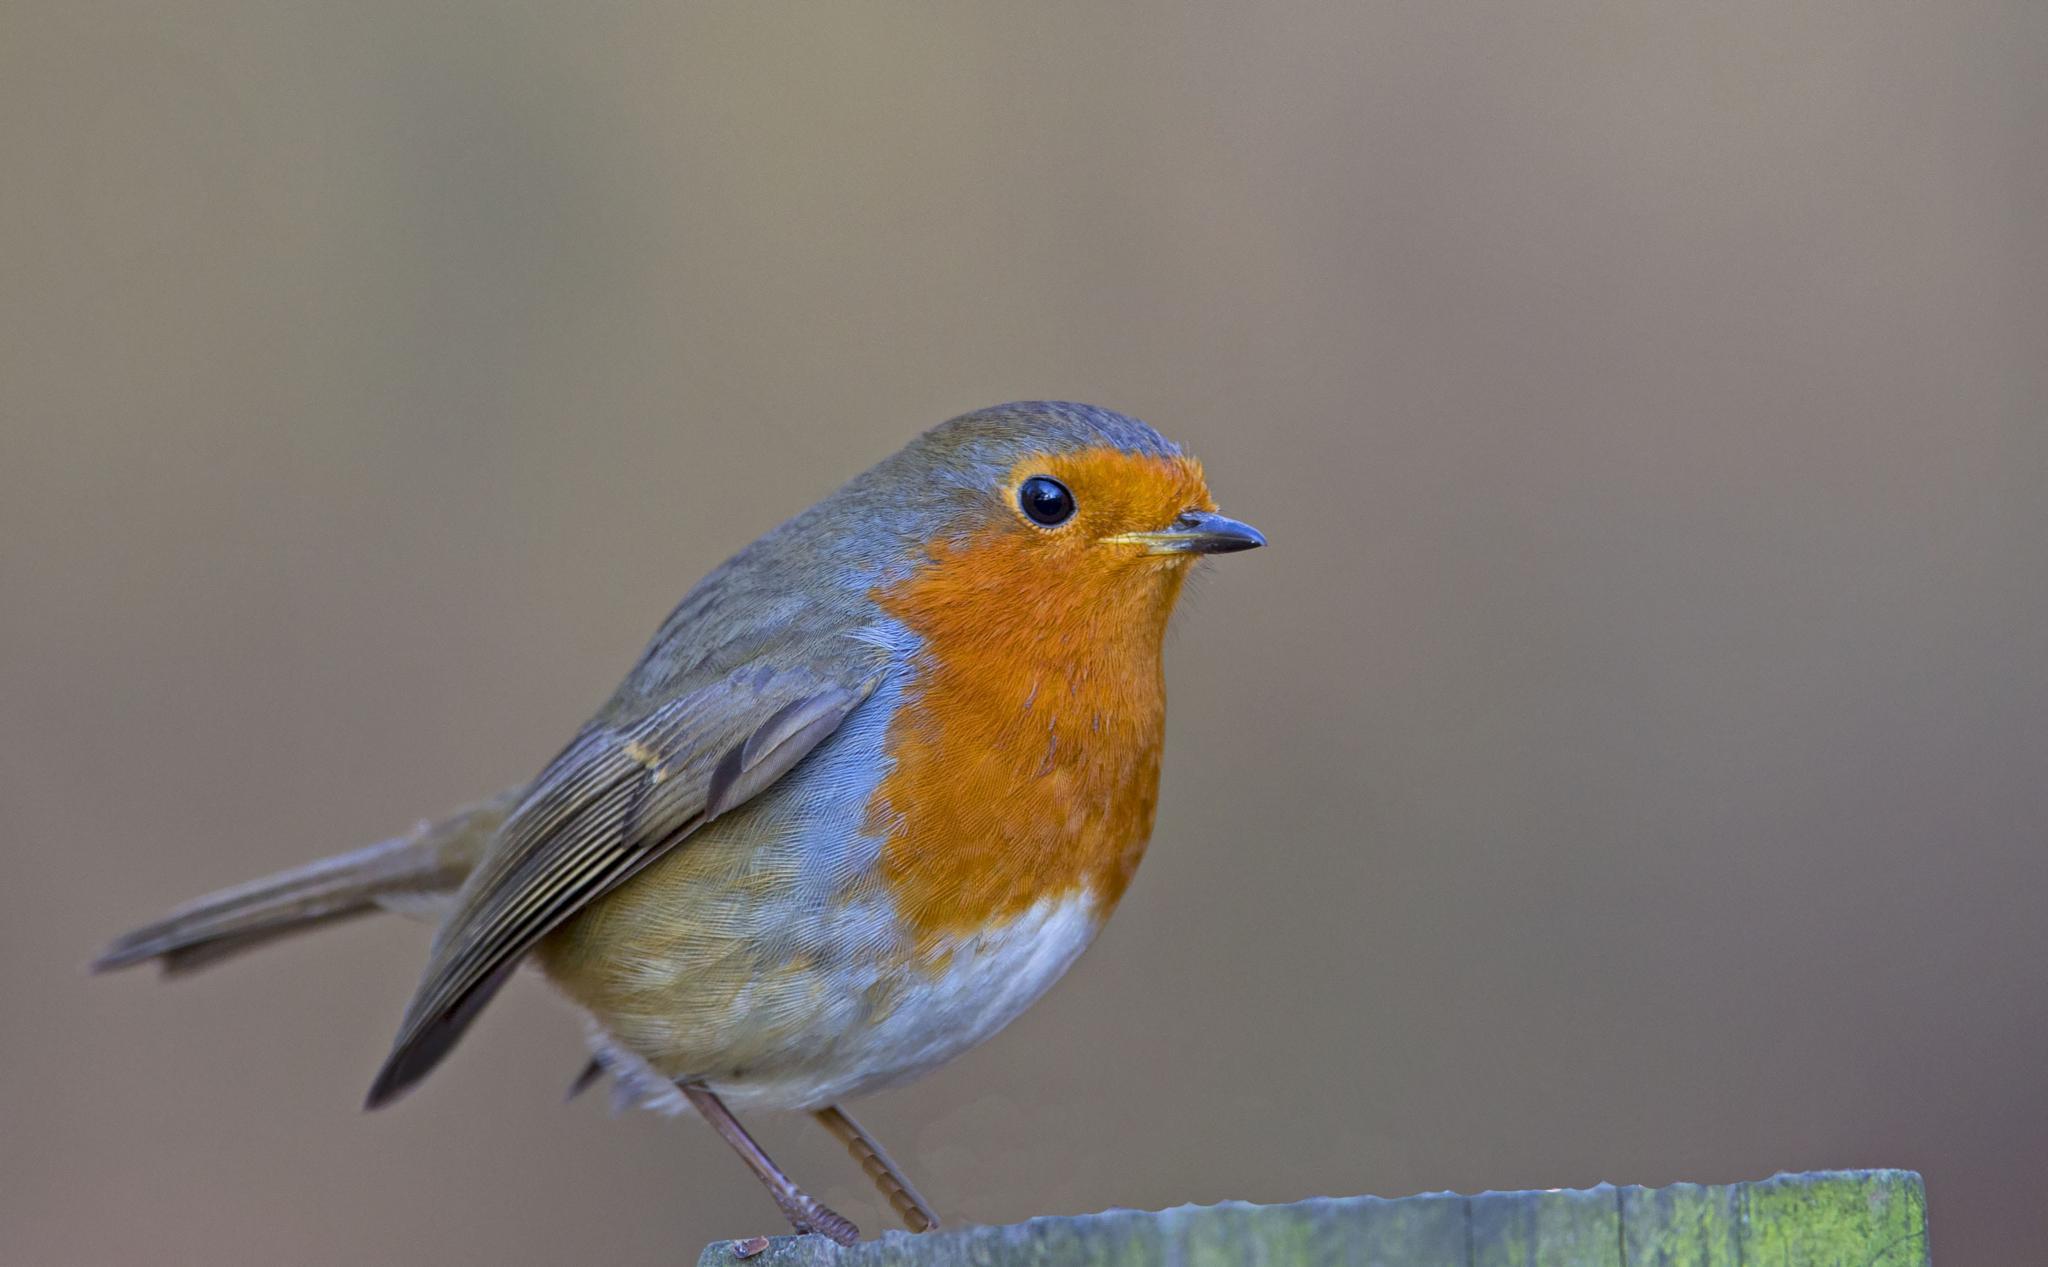 Robin by kingfisher